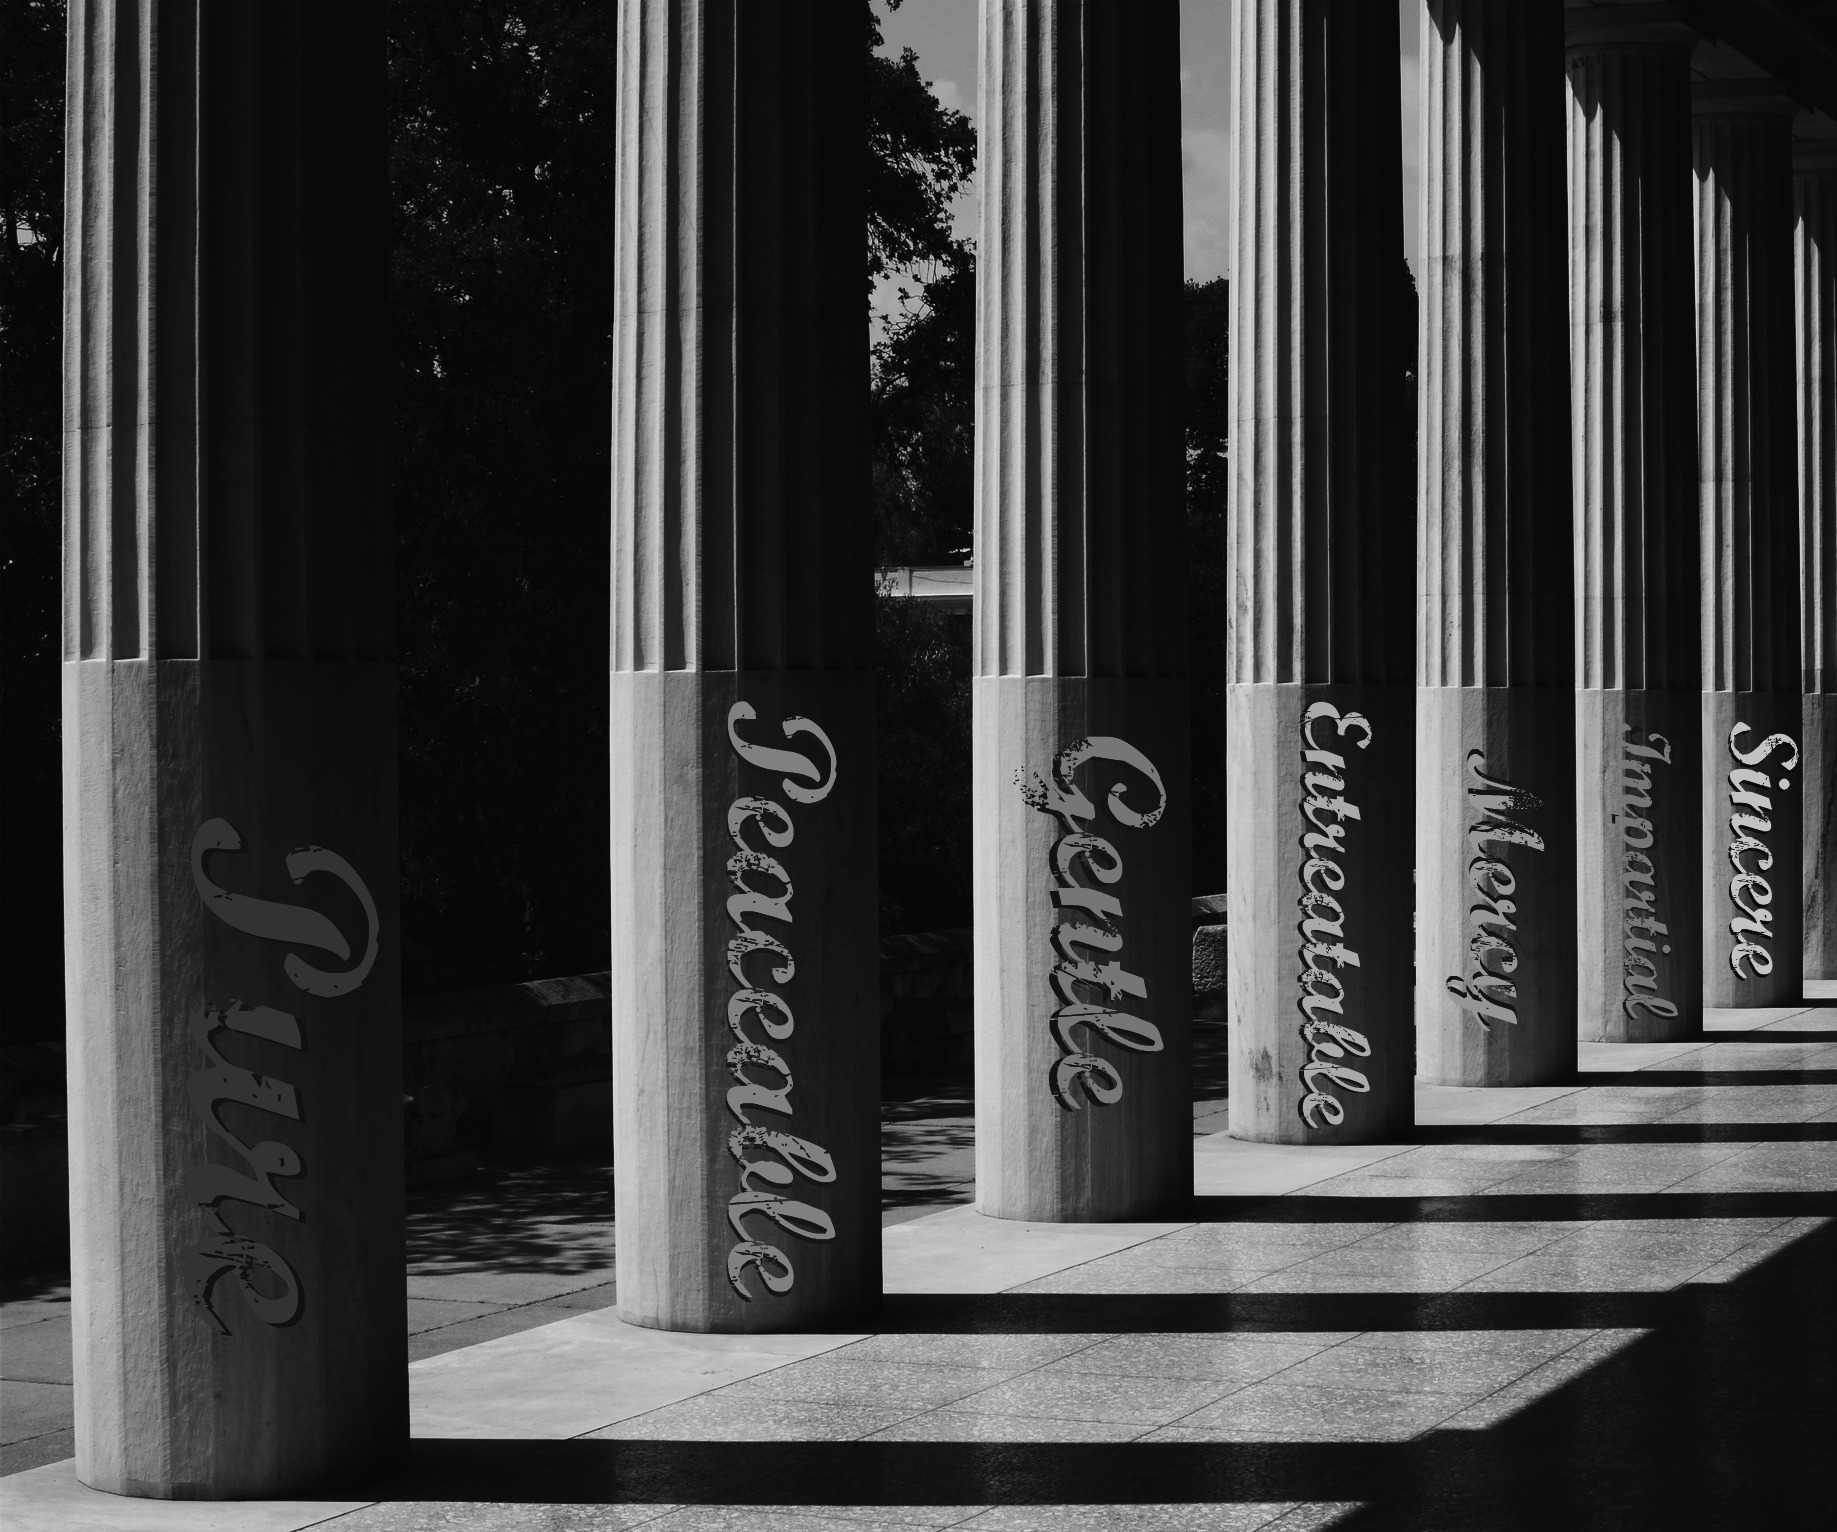 pillars of wisdom